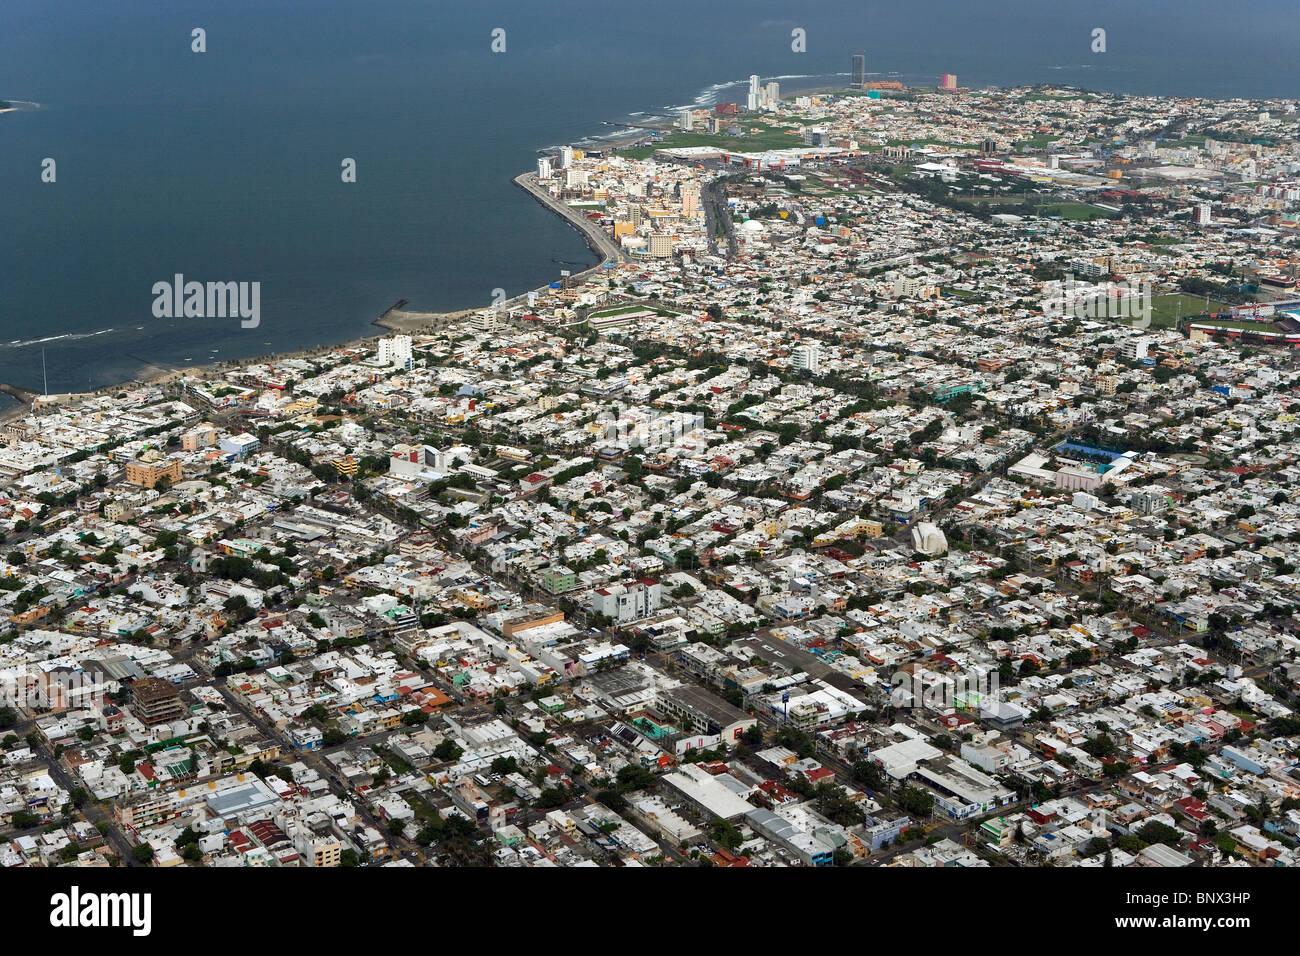 aerial view above Veracruz Mexico - Stock Image